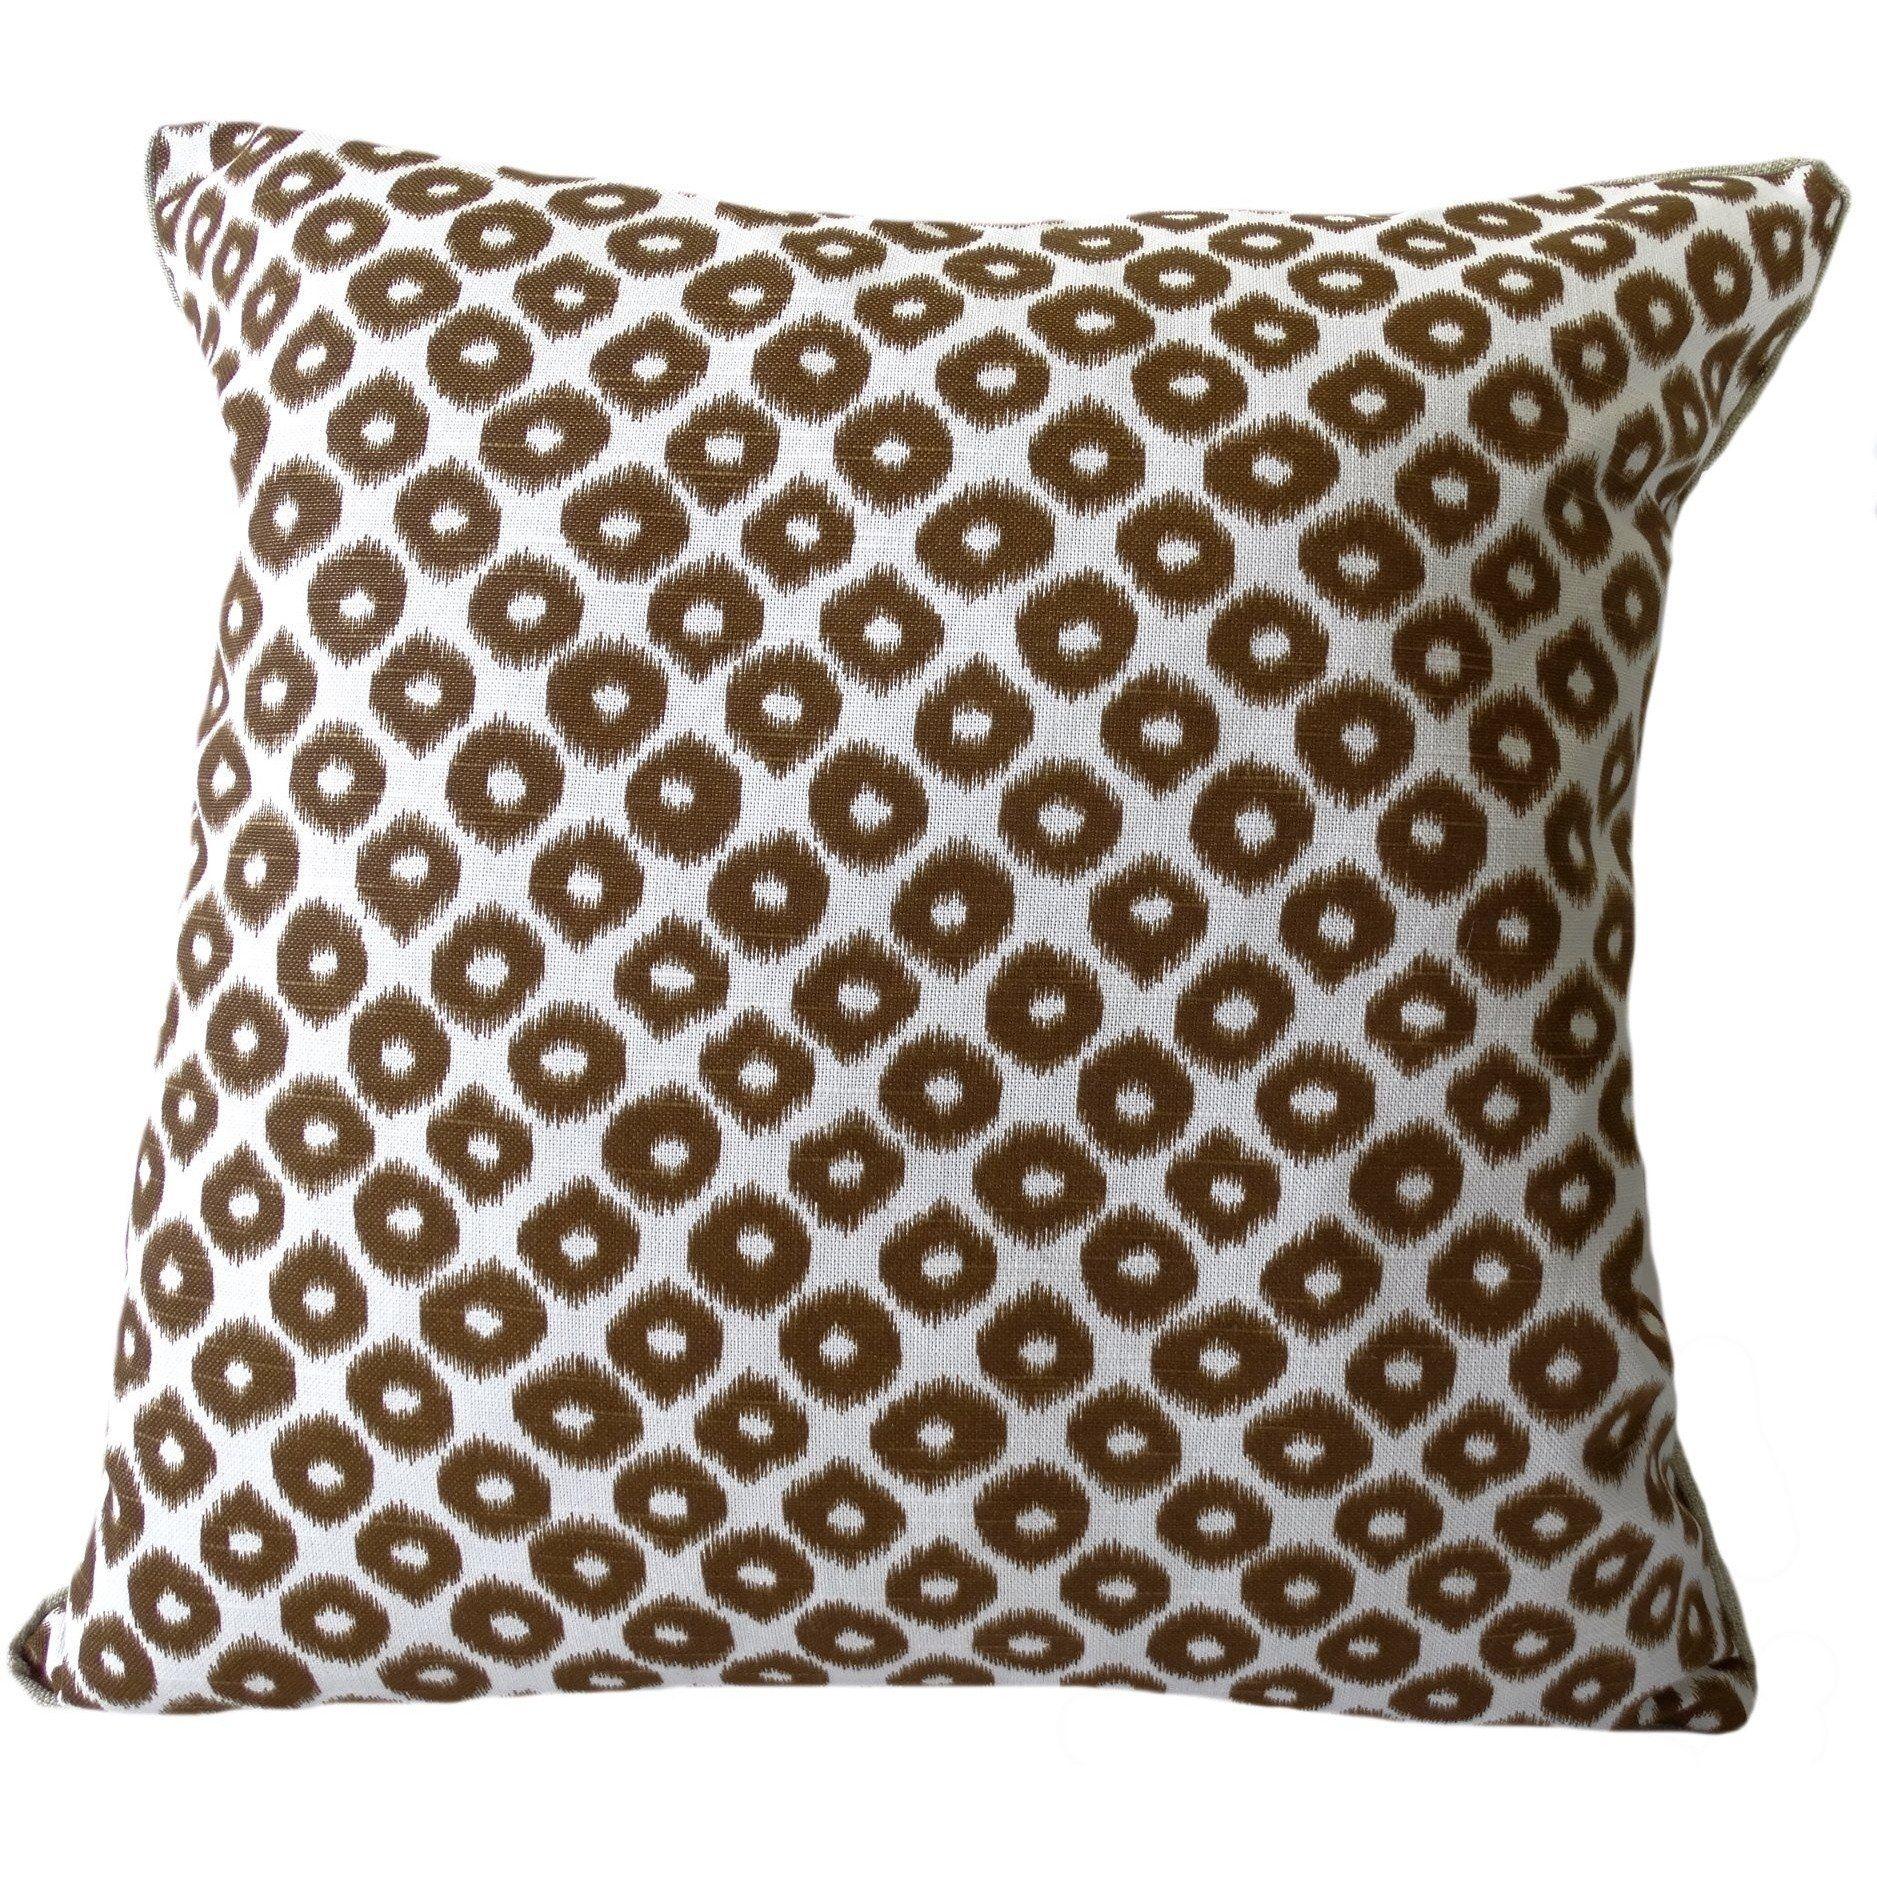 Bradford Mocha Brown Ikat Pillow Ikat Pillows Mocha